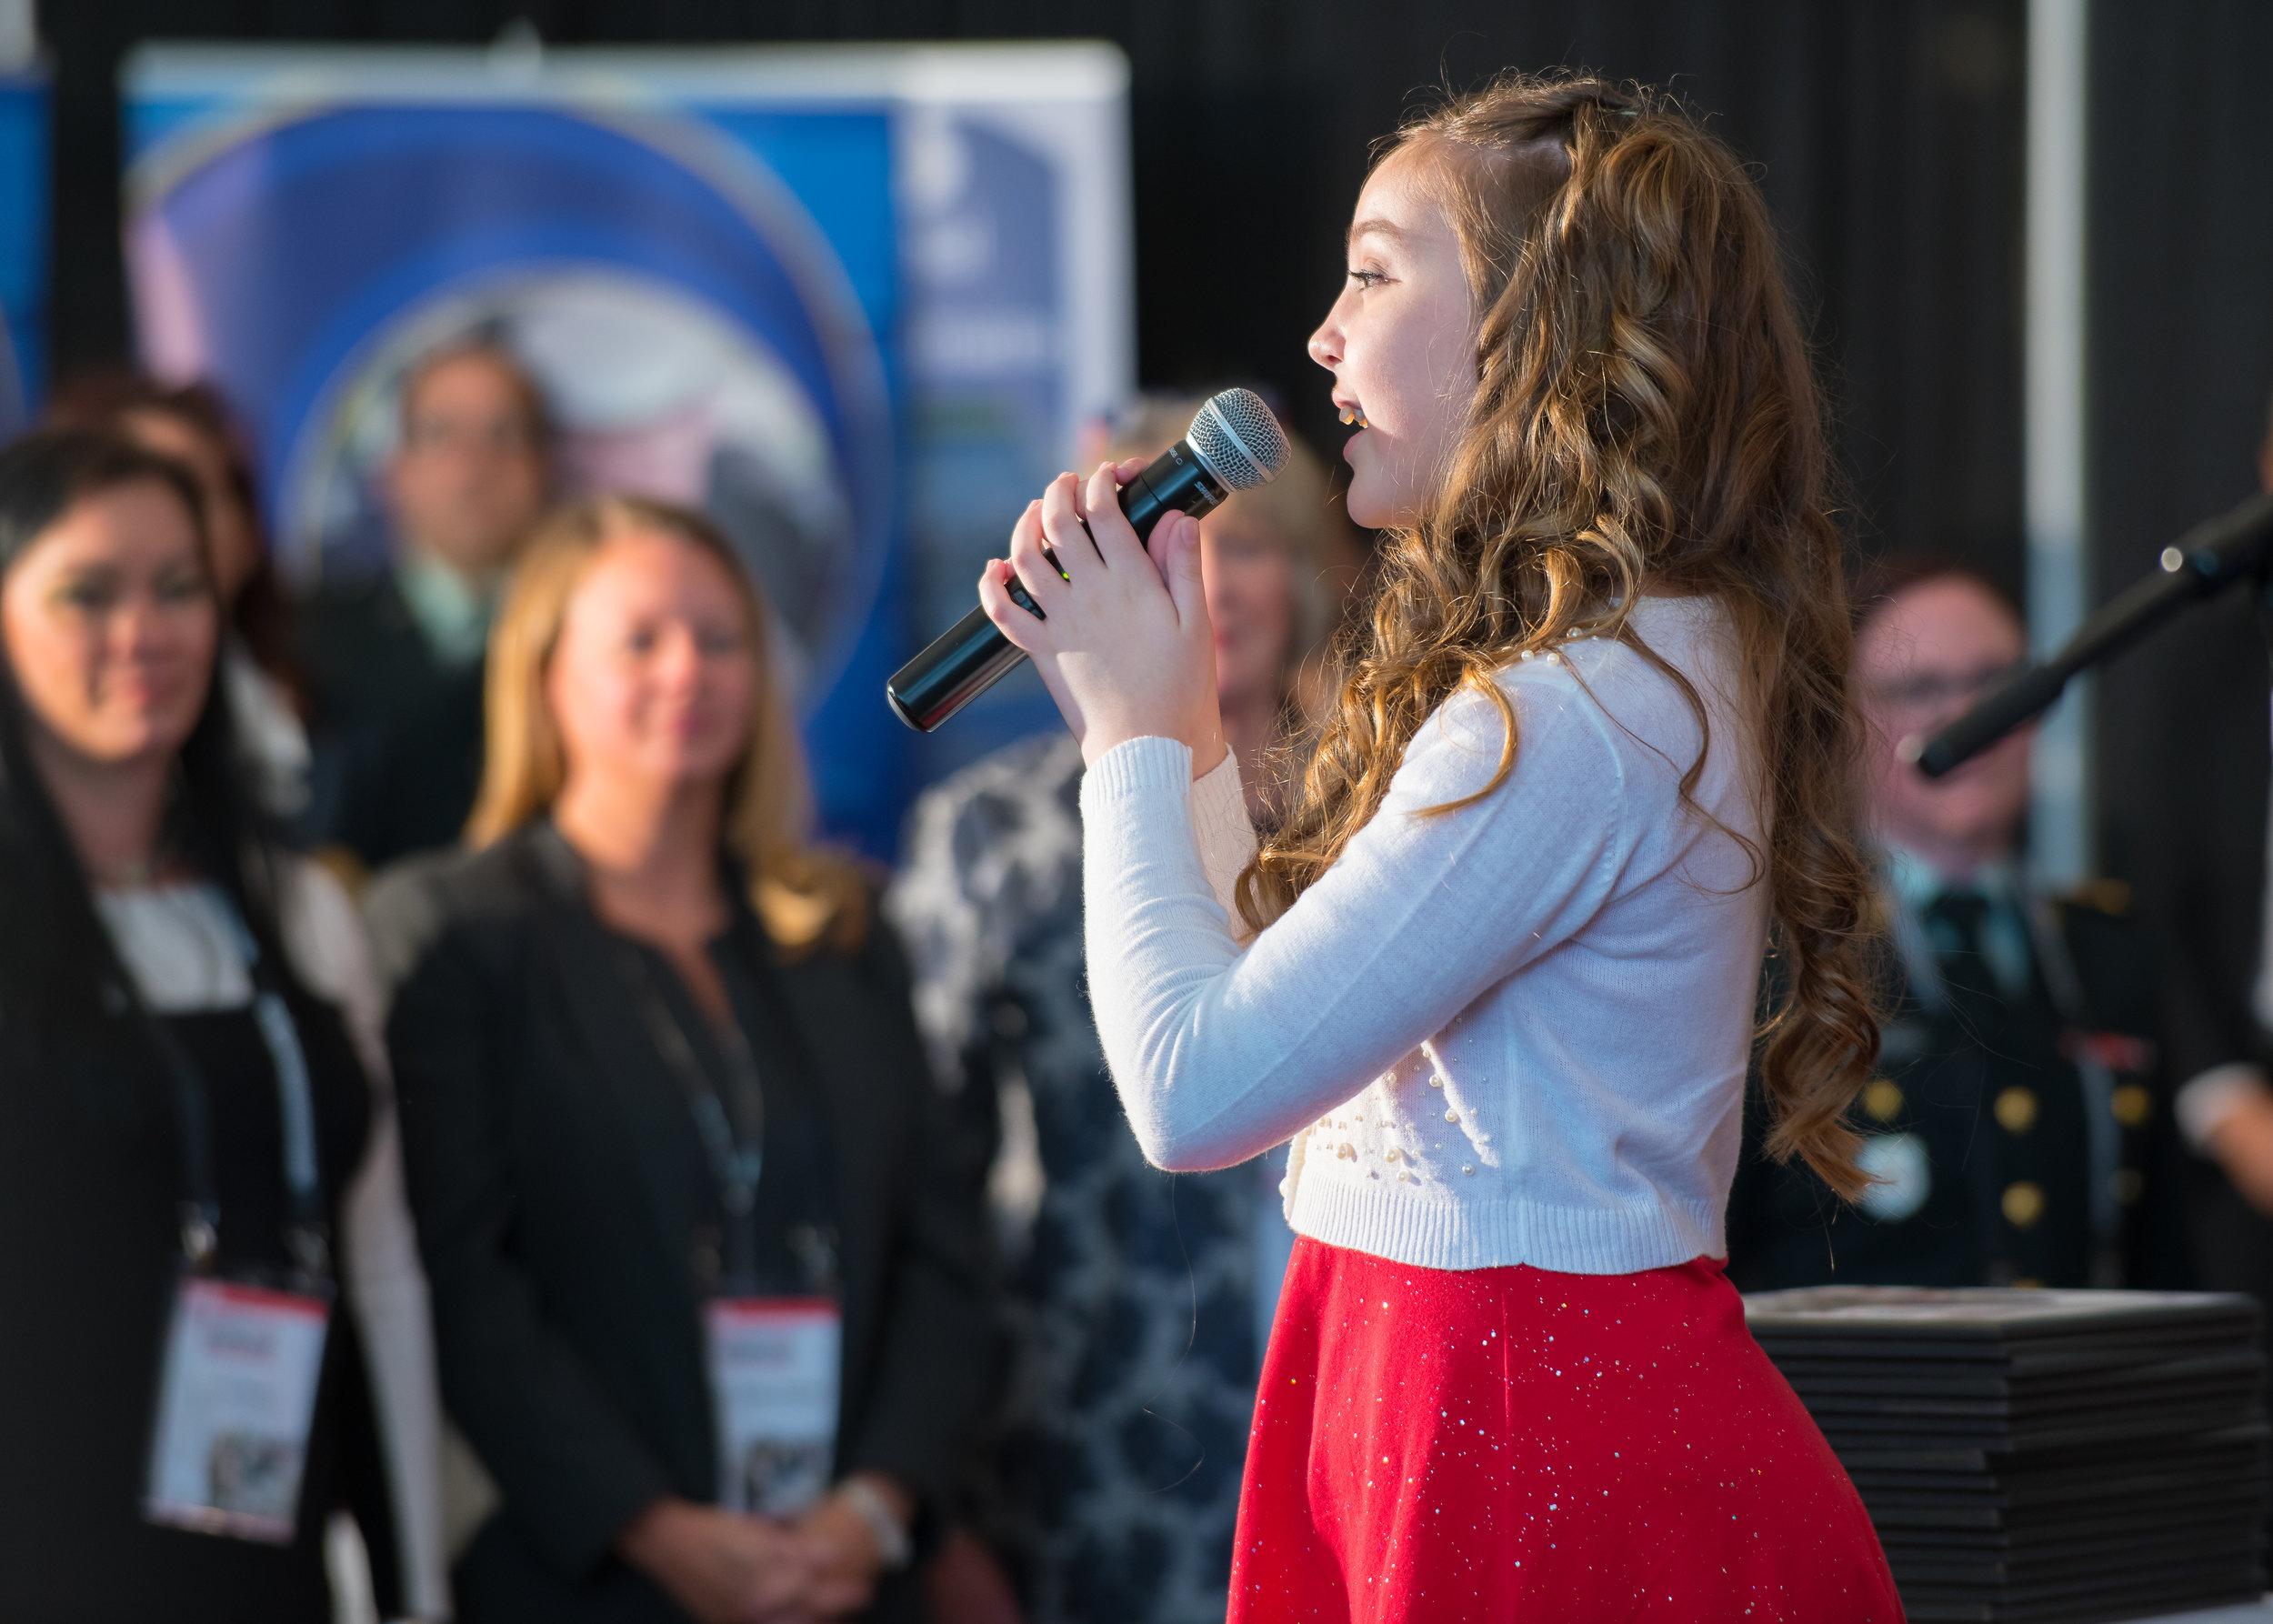 Mia Jovanovic sings the national anthem.